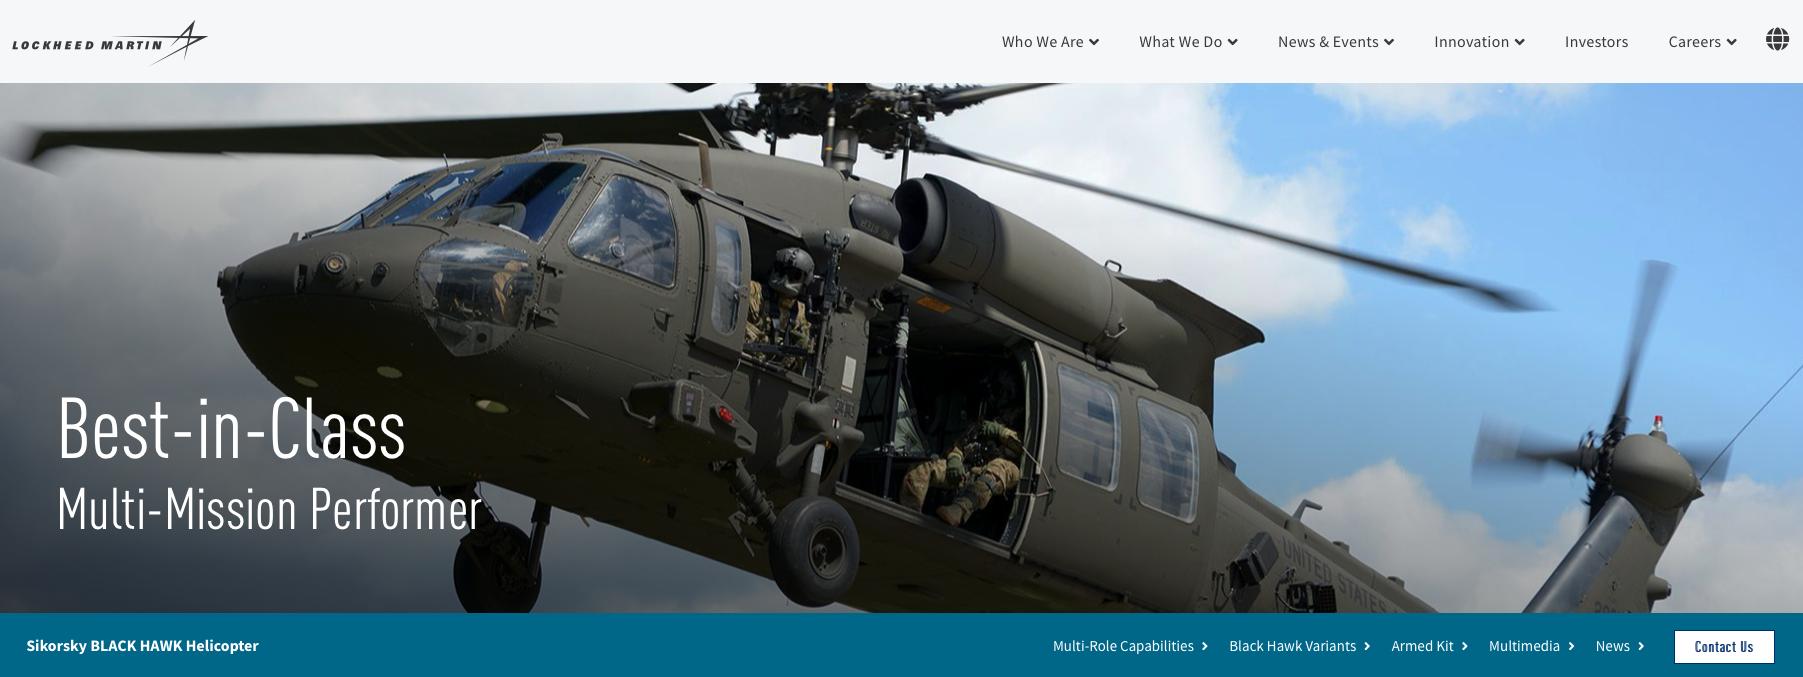 Black Hawk. 2019. Photo by Lockheed Martin